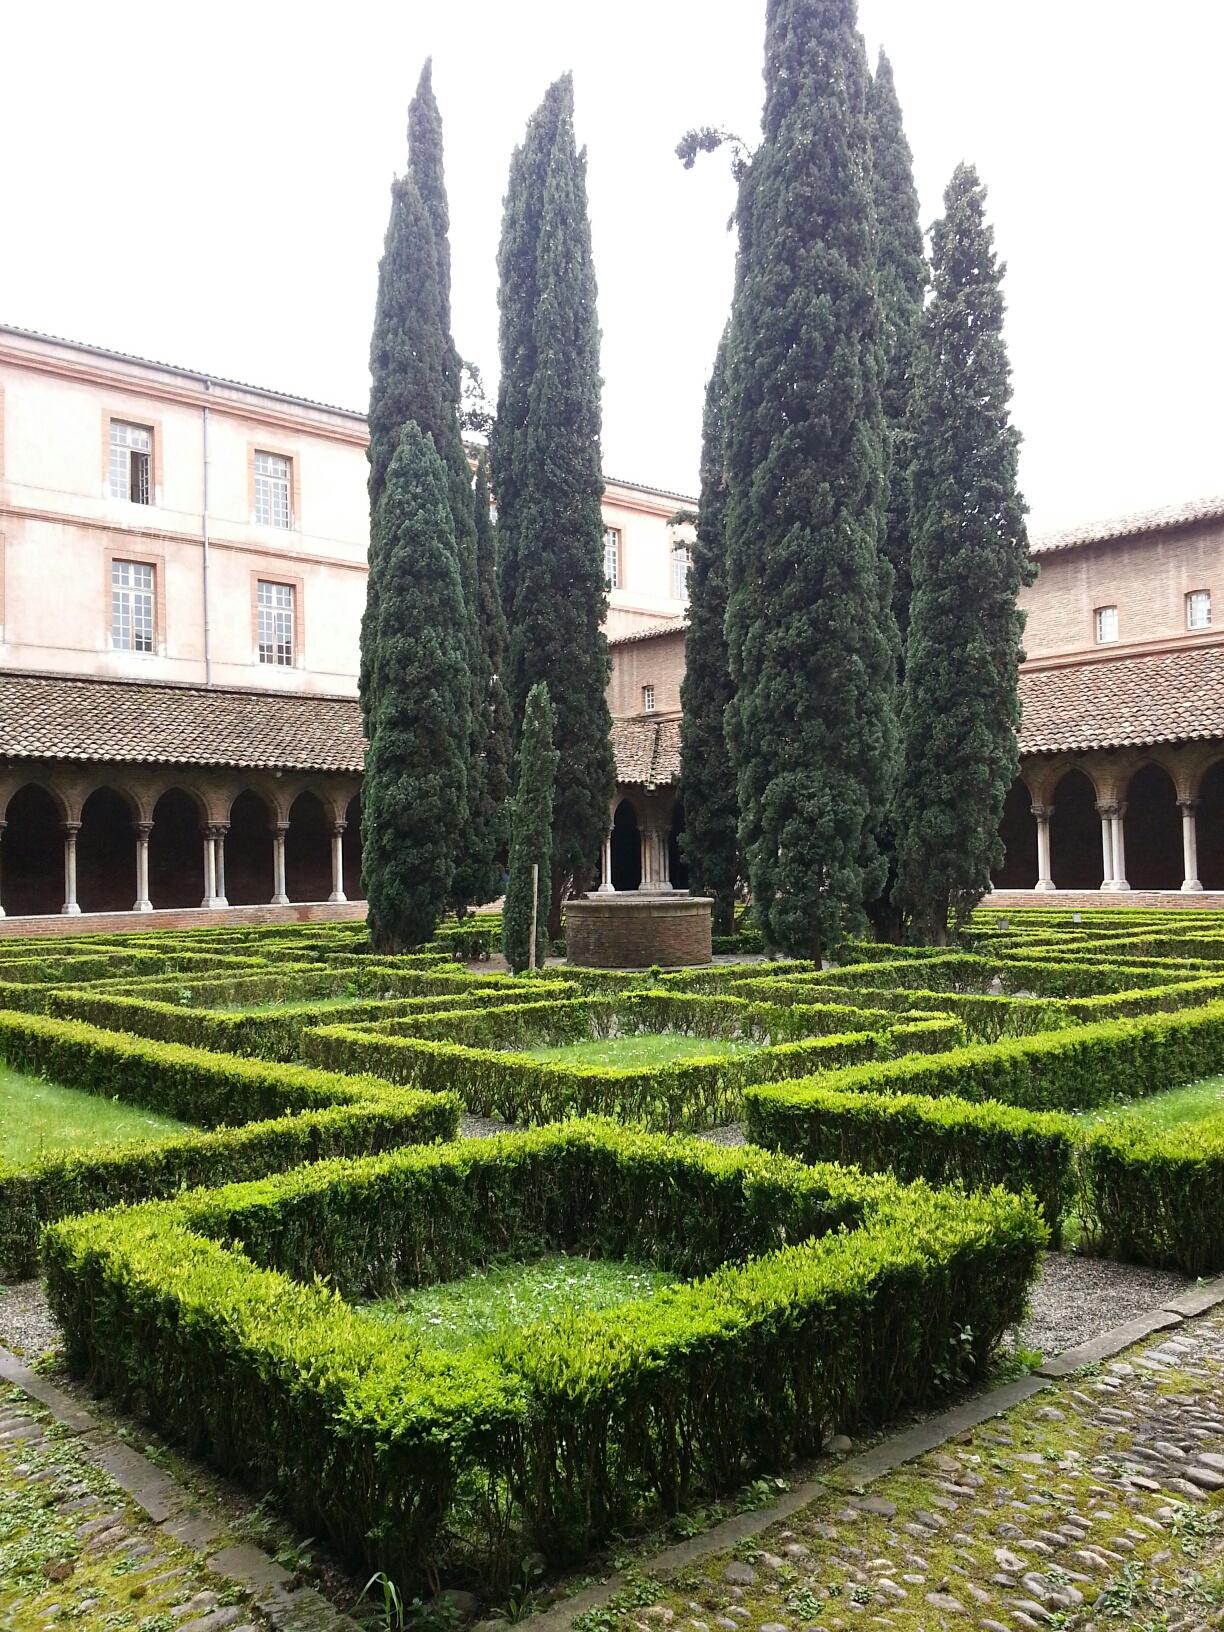 Jacobins cloister